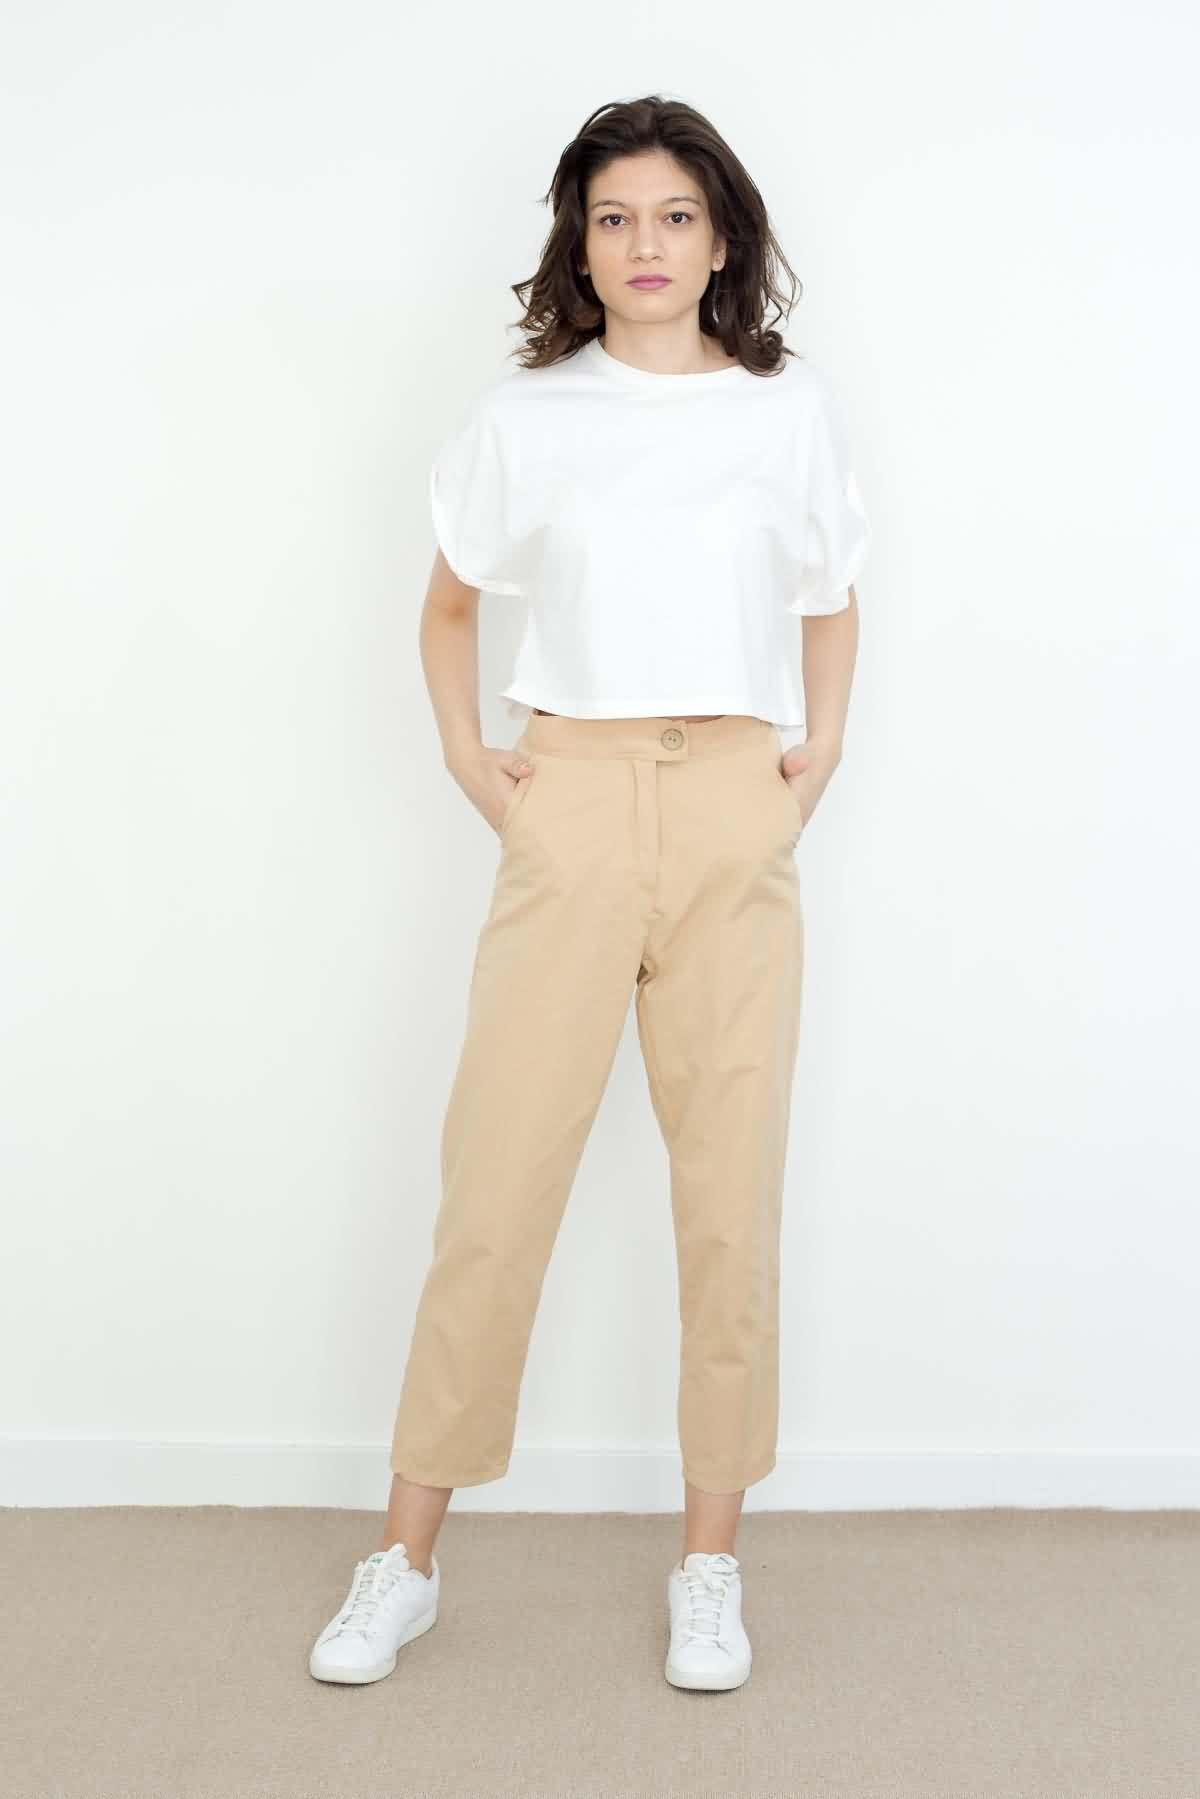 Mevra - Yüksek Bel Pantolon Bej